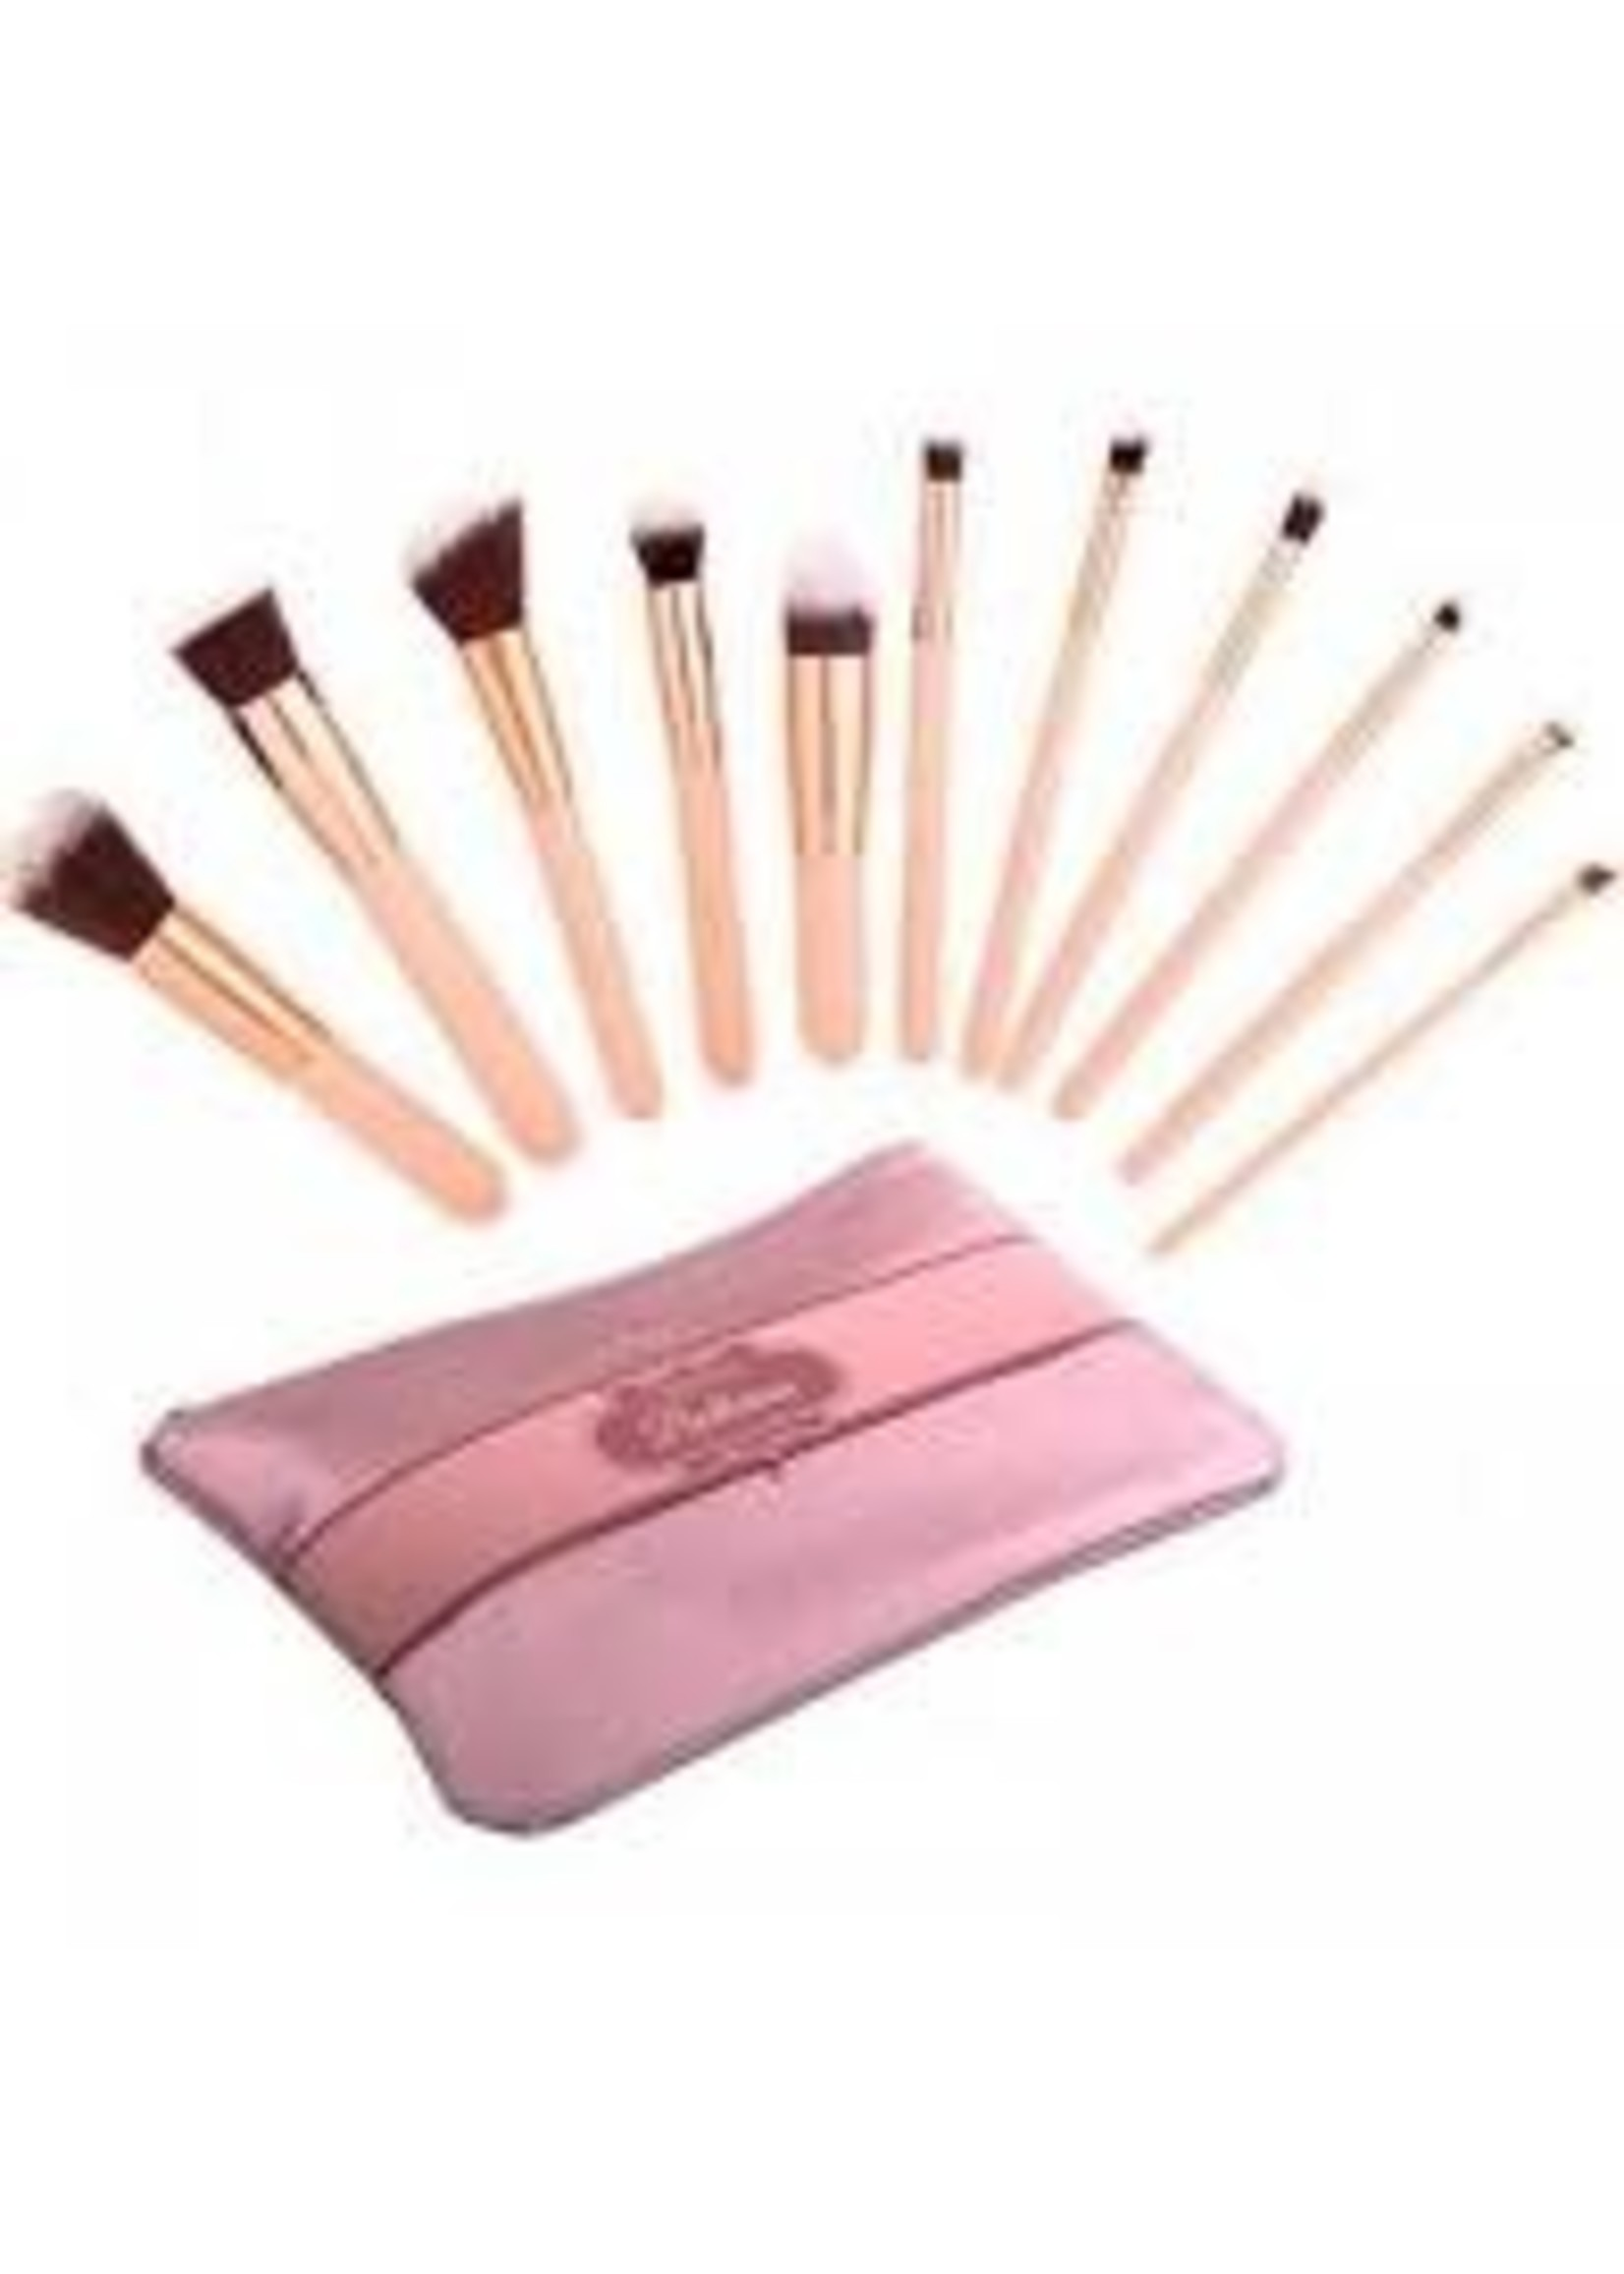 Beauty Creations Ballerina 12PC Rose Gold Brush